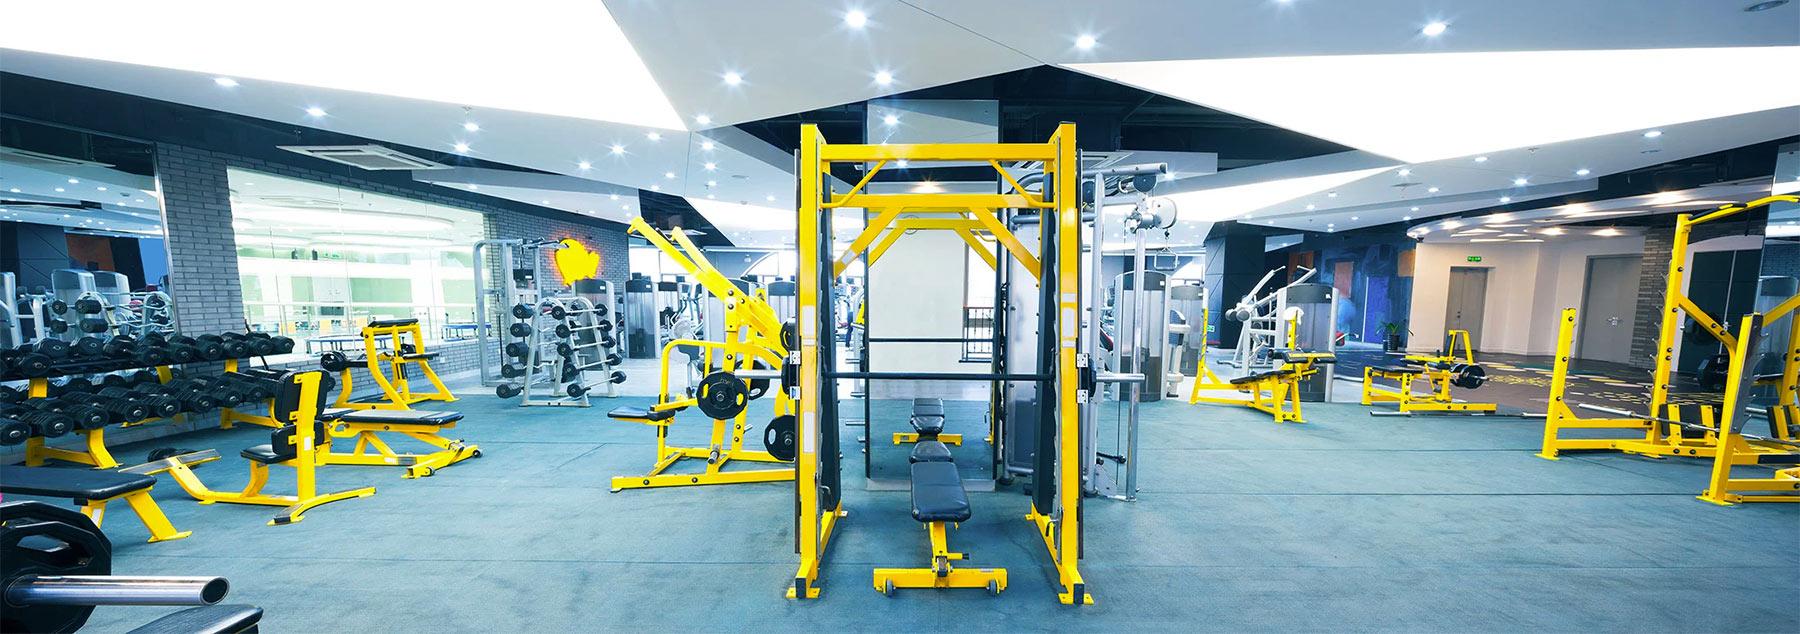 ind_full_fitness